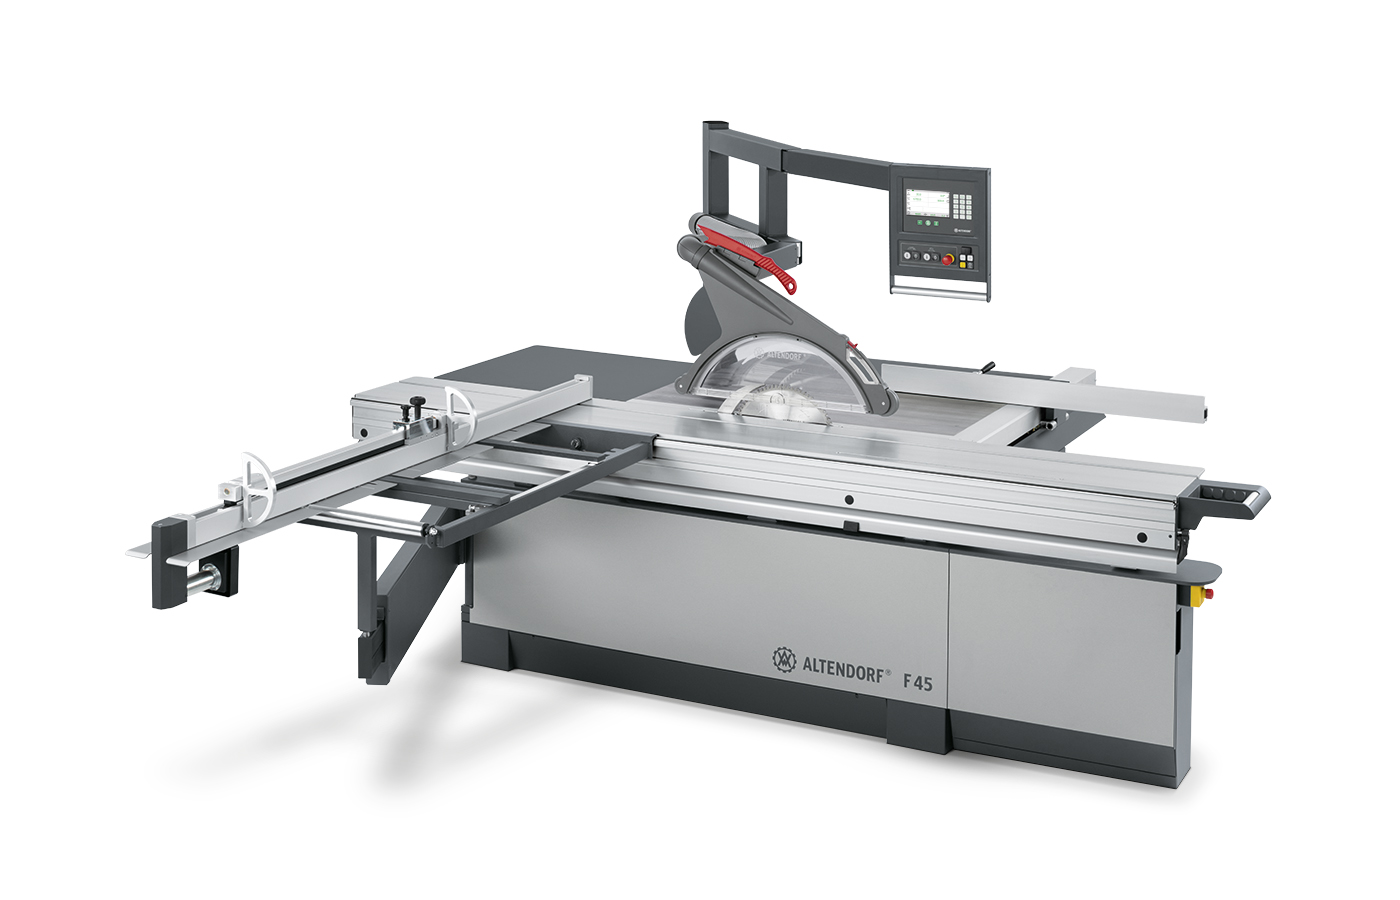 ماشین آلات صنعت mdf